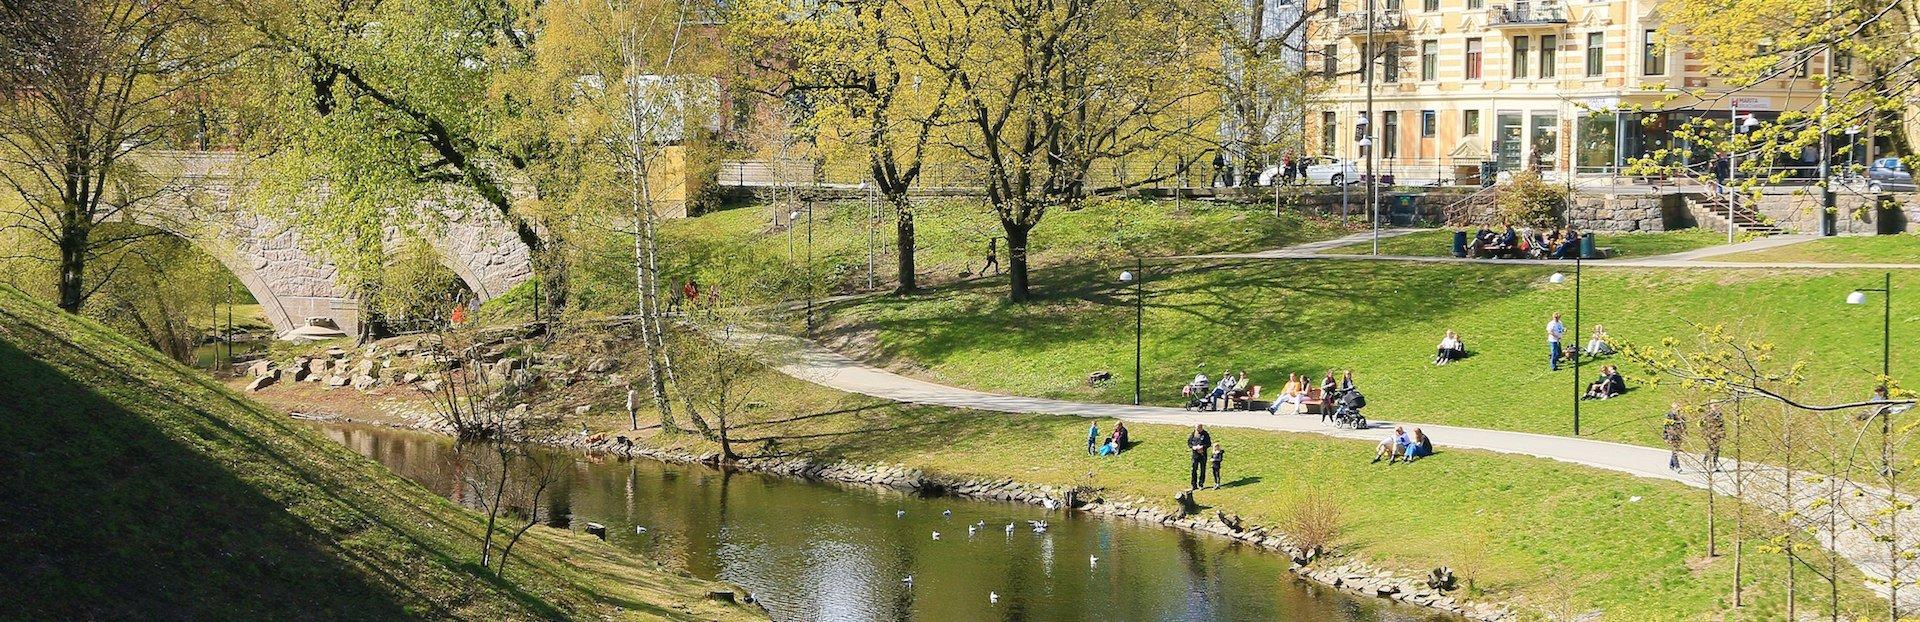 Oslo audio tour: Upstream: Along the riverside of Akerselva